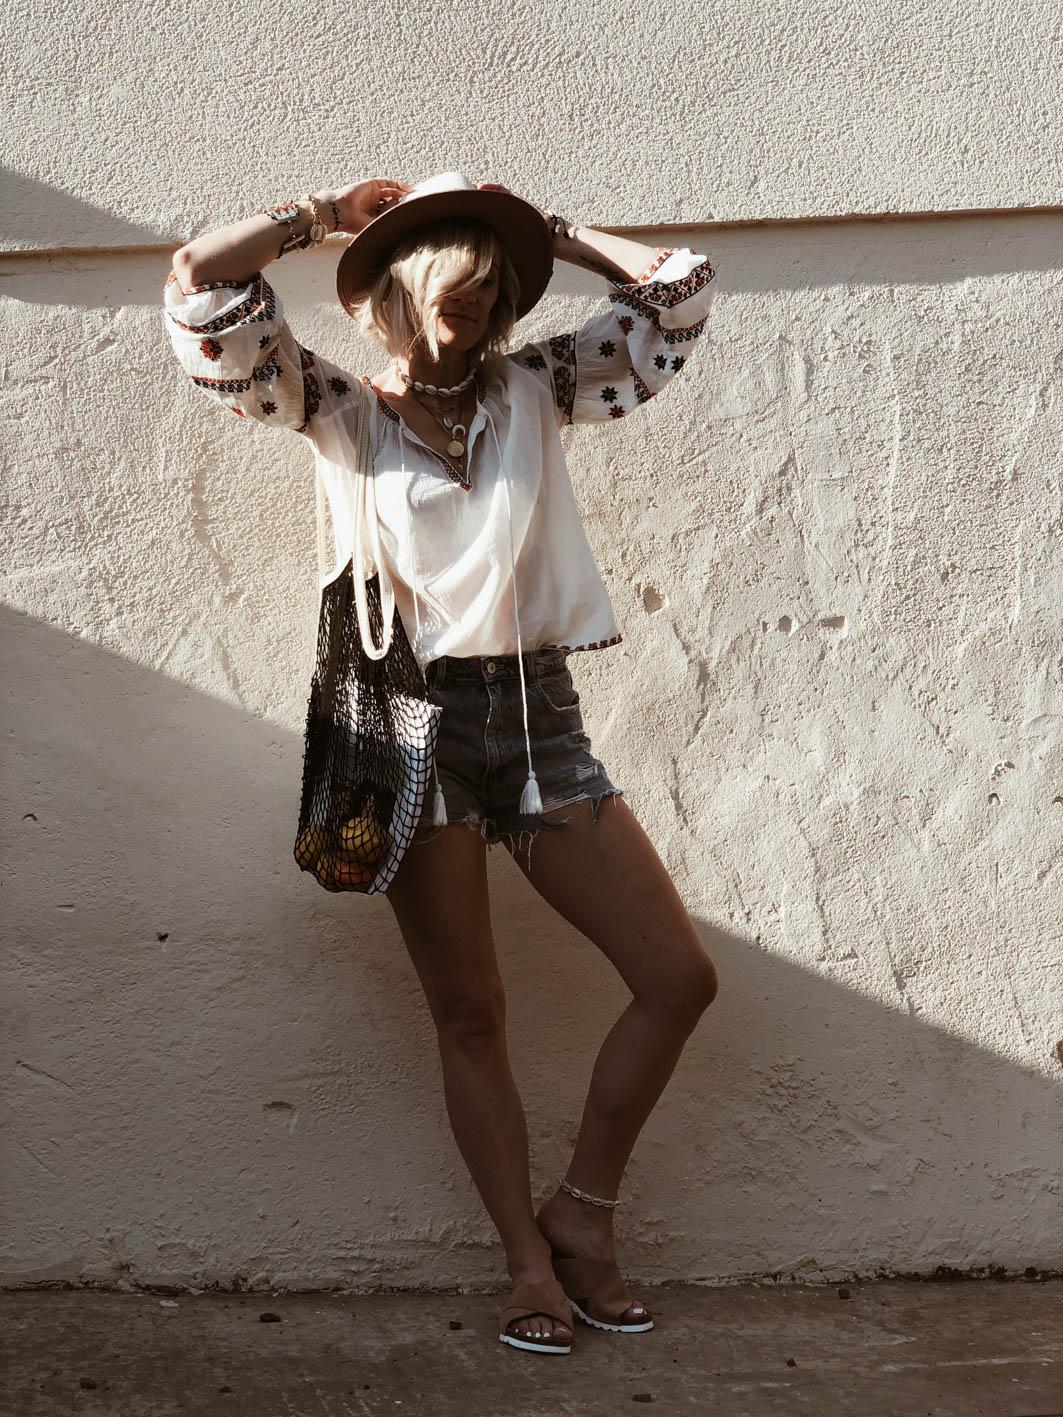 Carnet Sauvage - blog mode et tendances Lille, blouse brodée Starmela